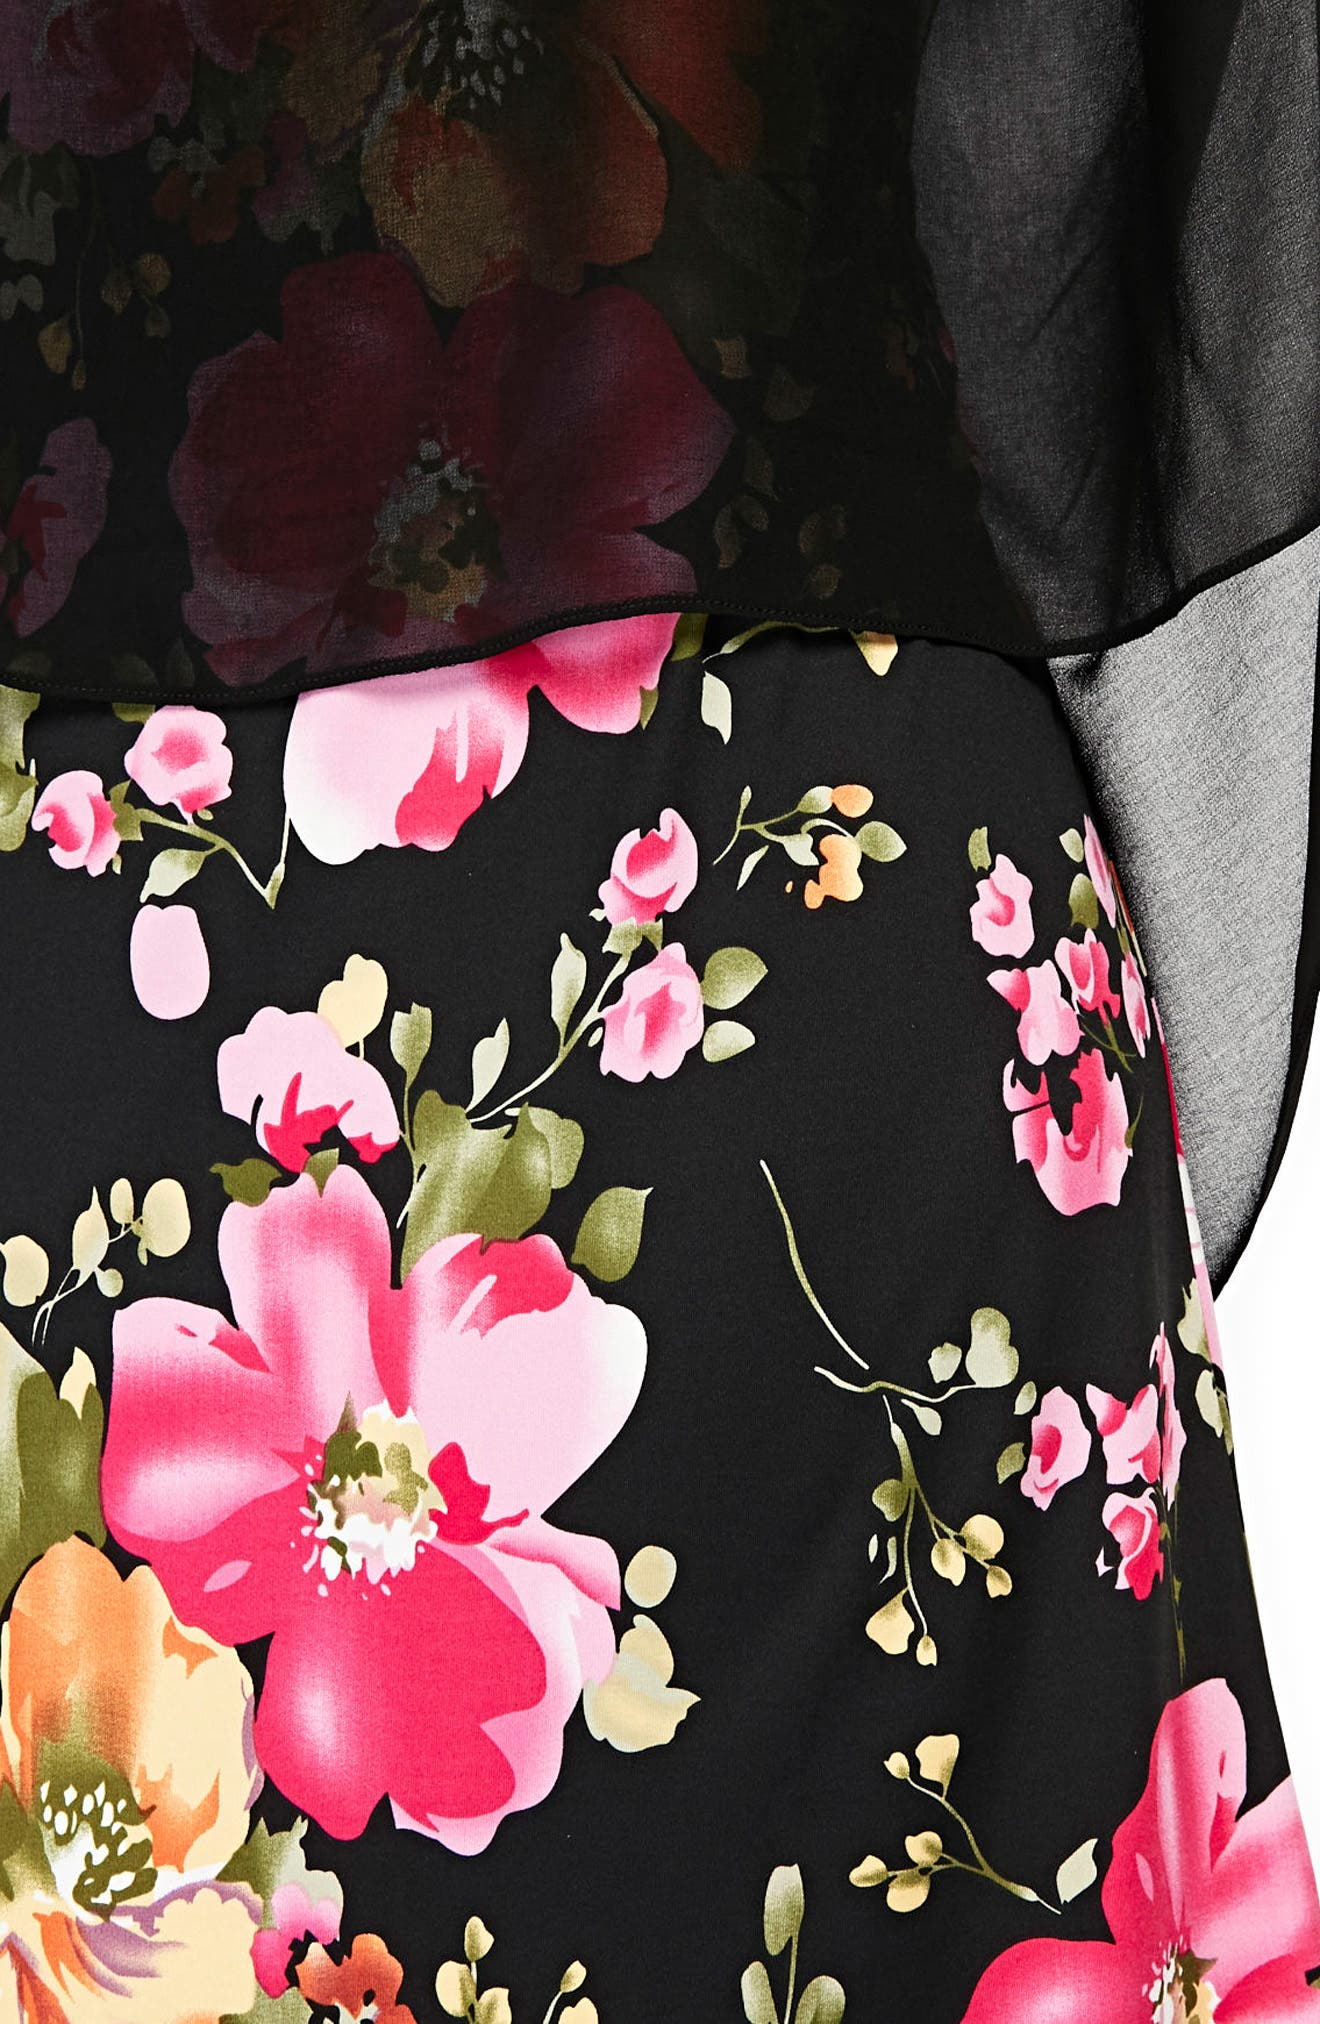 Floral Overlay Shift Dress,                             Alternate thumbnail 3, color,                             Black